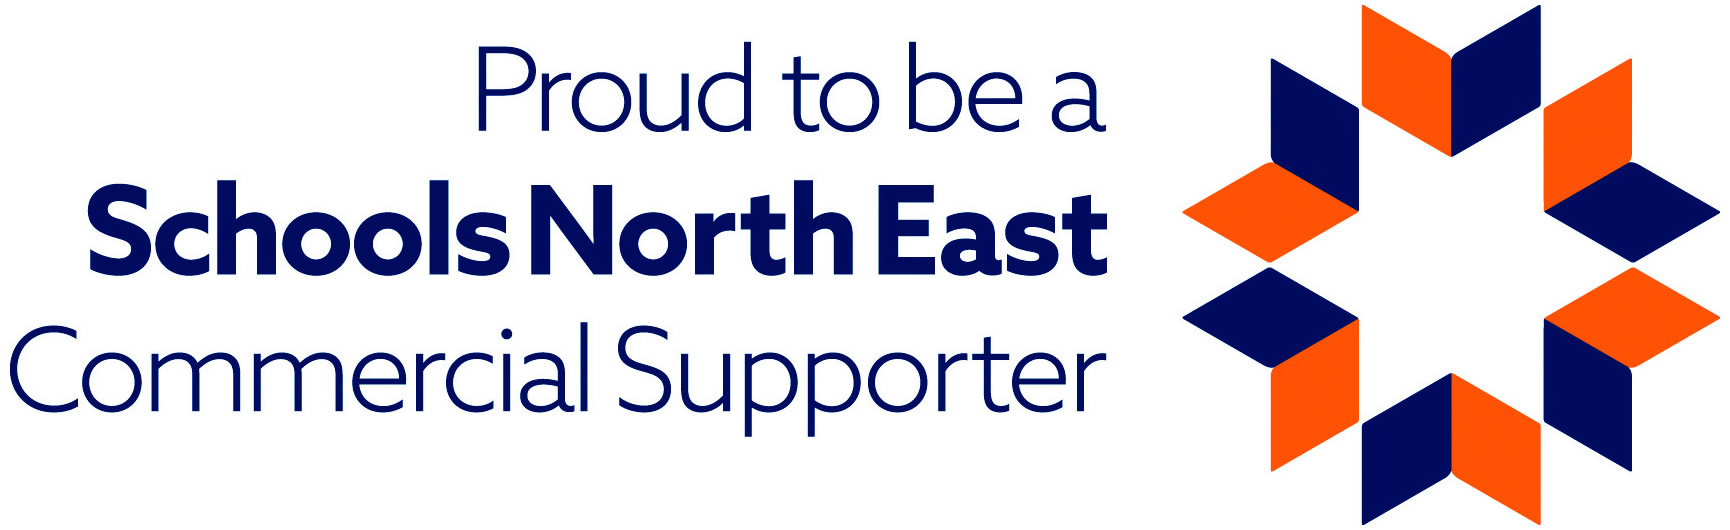 Schools North East